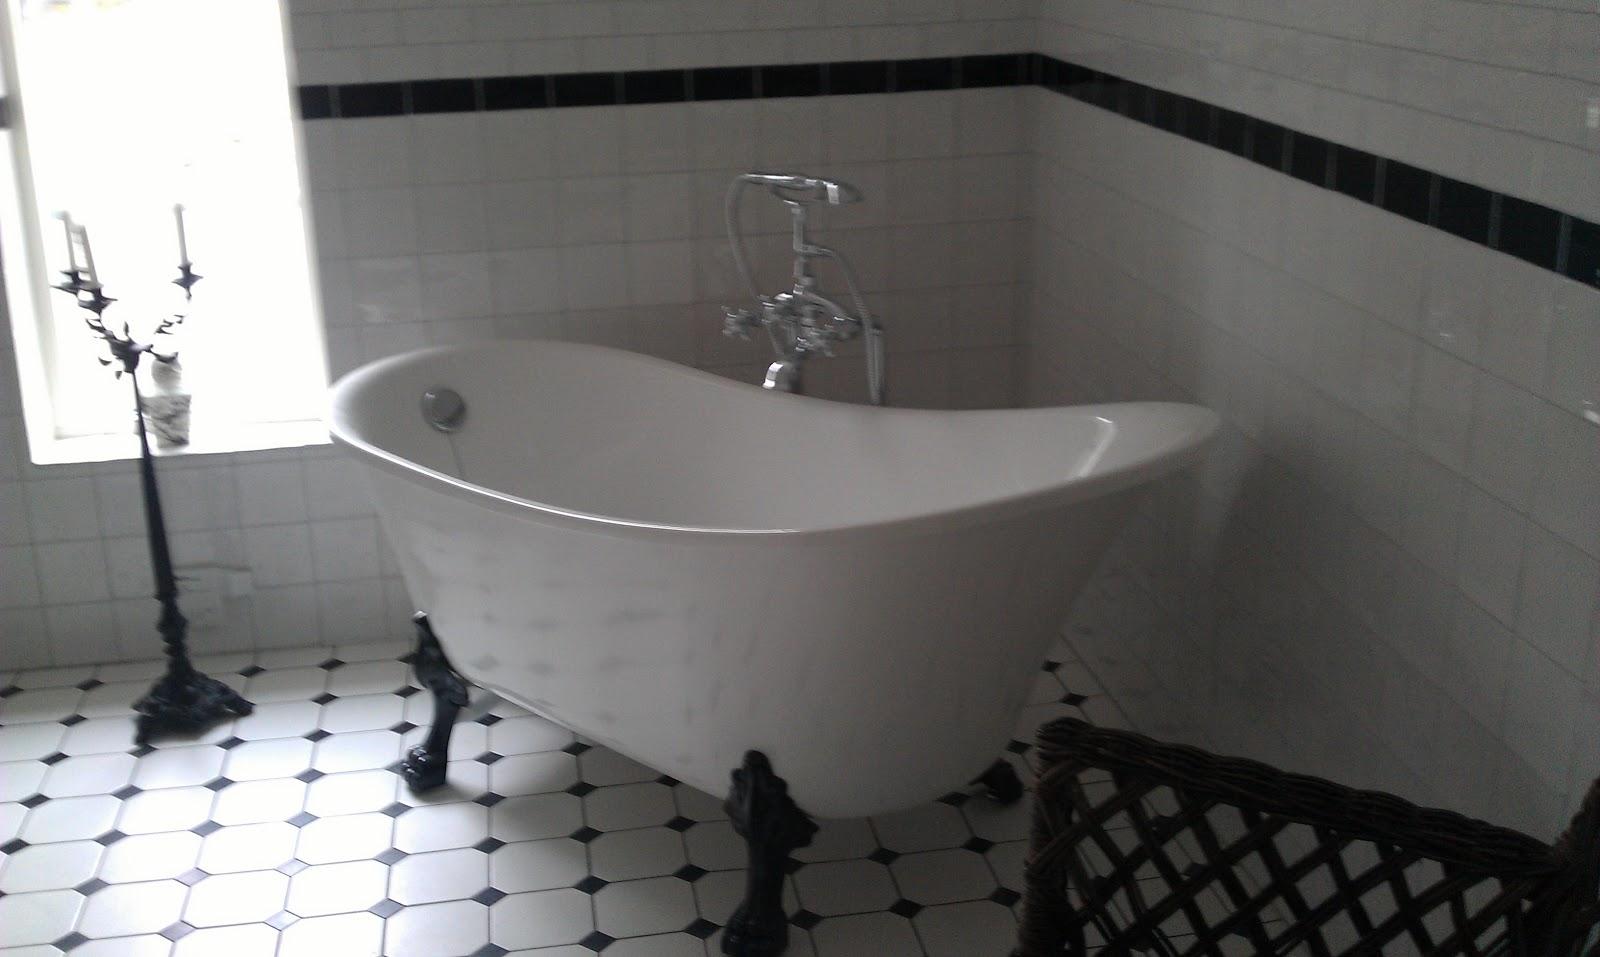 Sassa & COMPANY: En liten glimt av vårt nya badrum